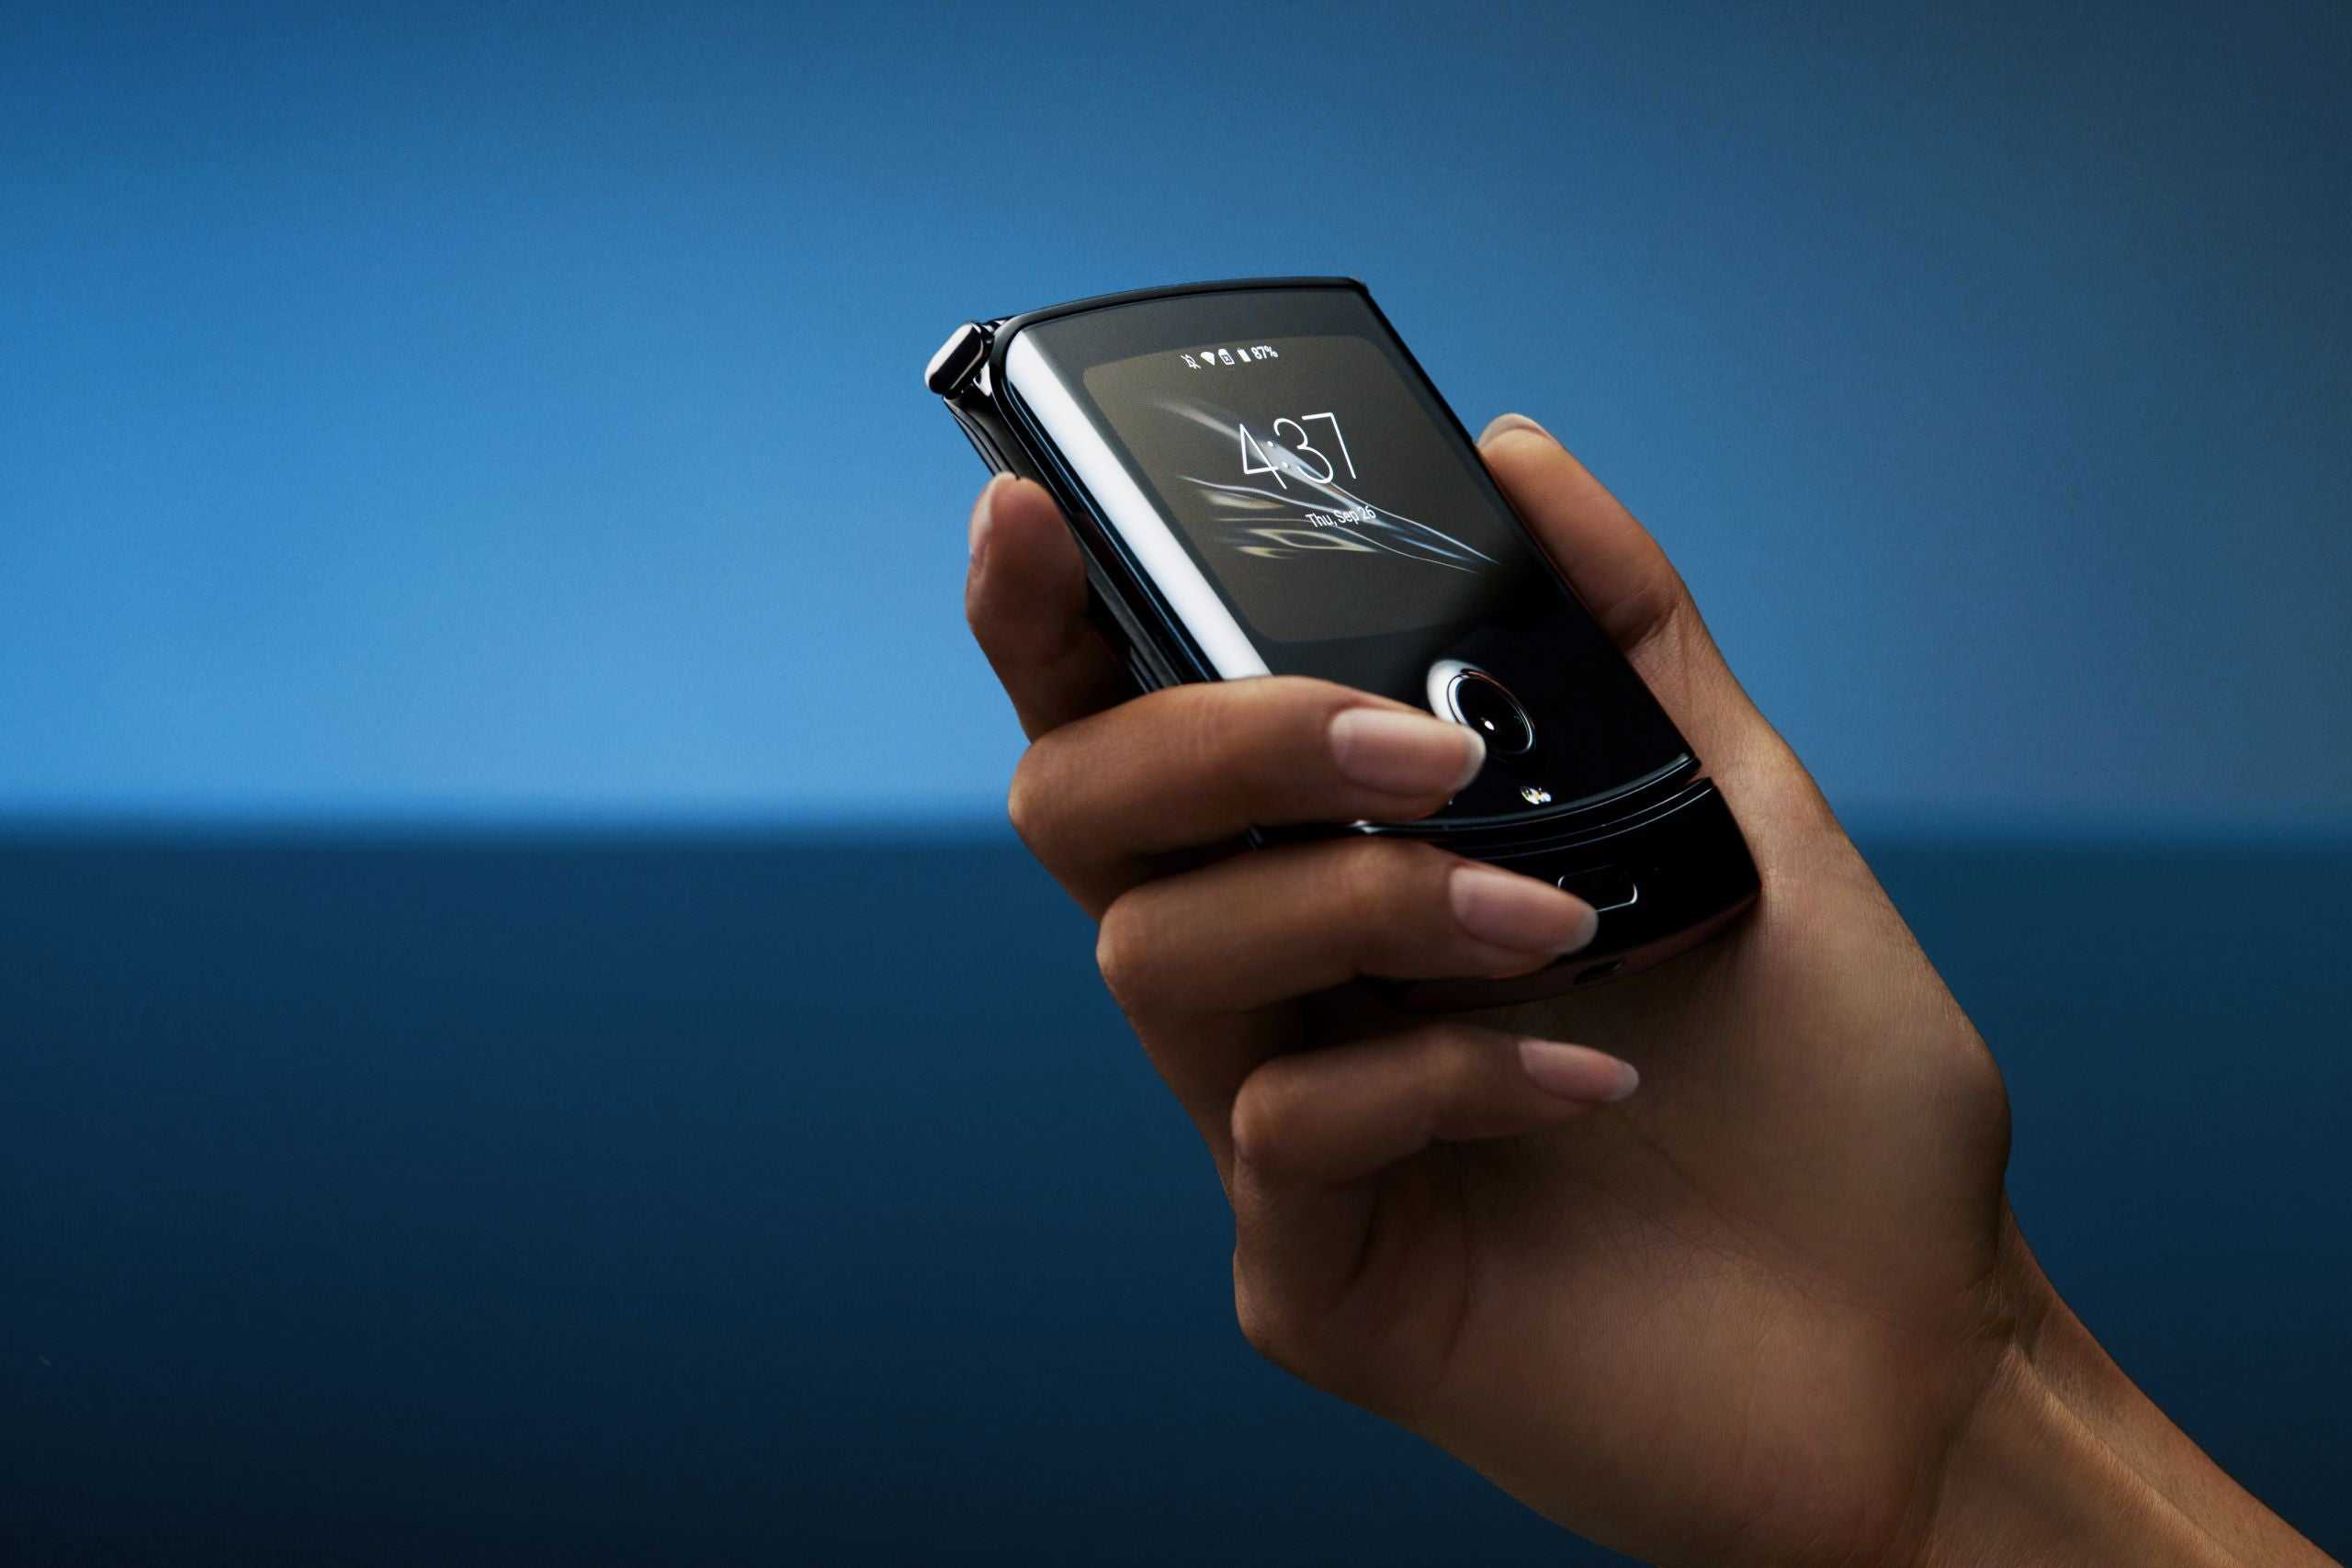 A Motorola Razr, a smartphone with a folding screen